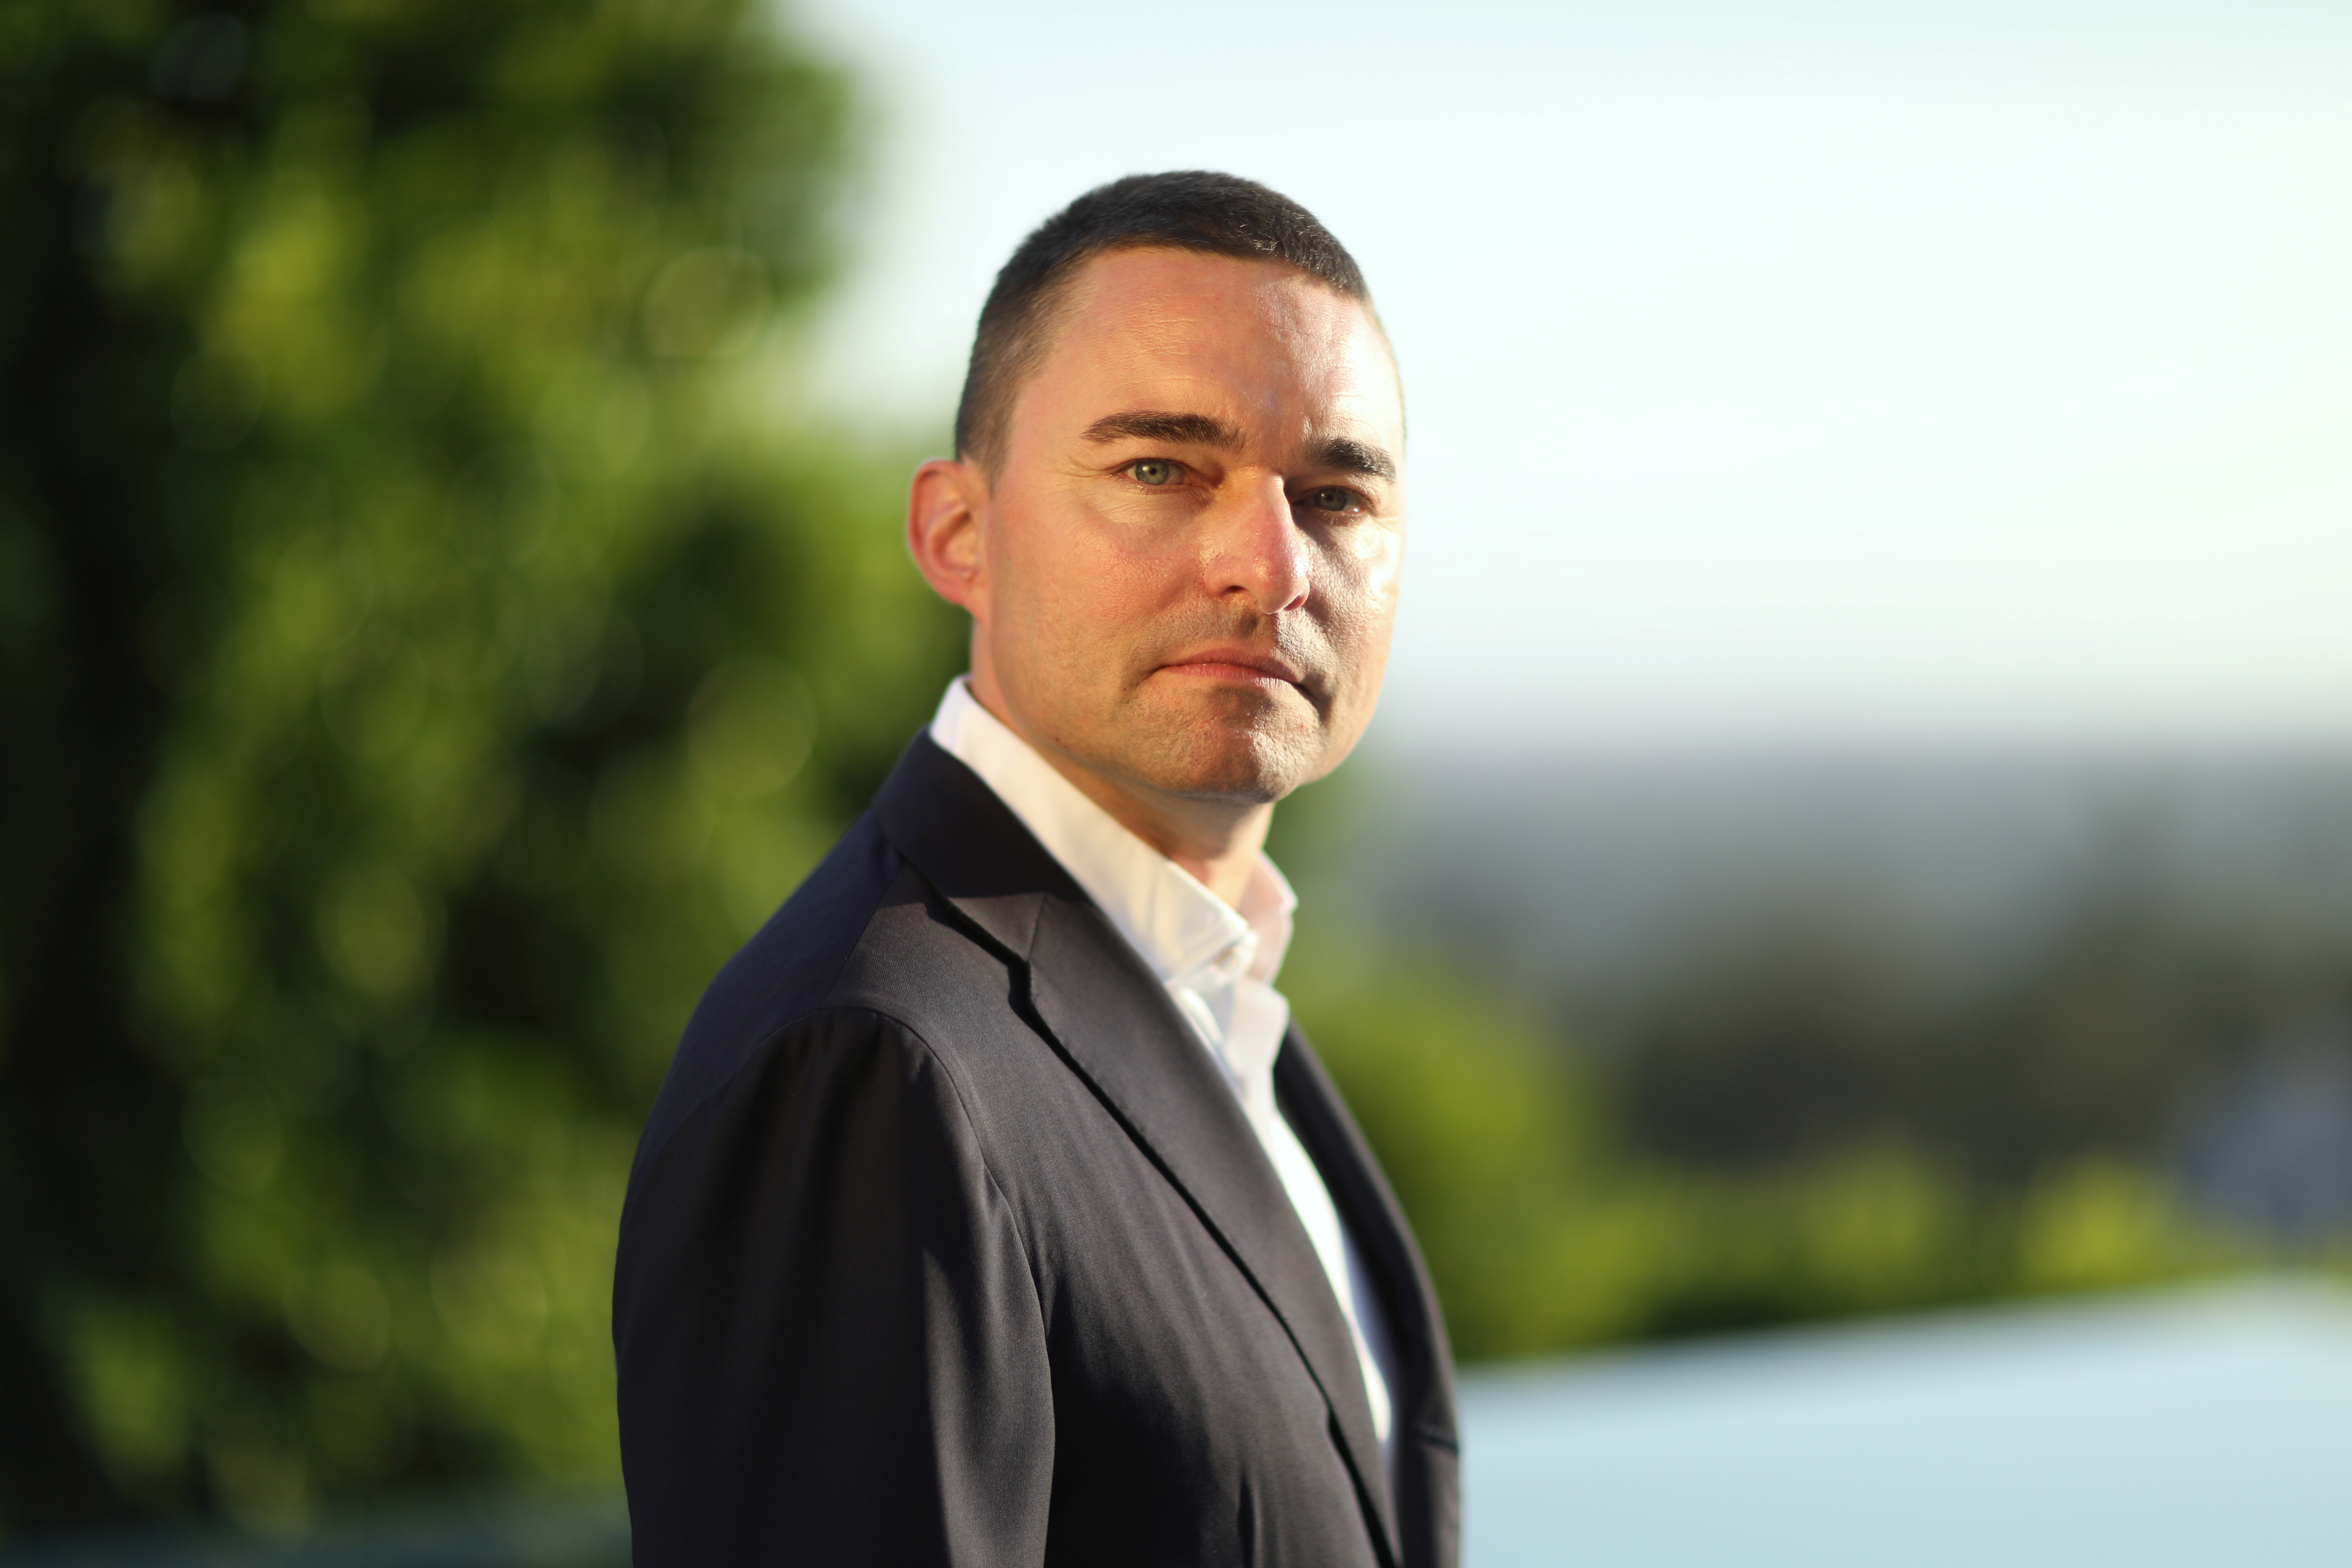 German investor Lars Windhorst poses for a portrait in Los Angeles, California, U.S., July 11, 2021. REUTERS/David Swanson